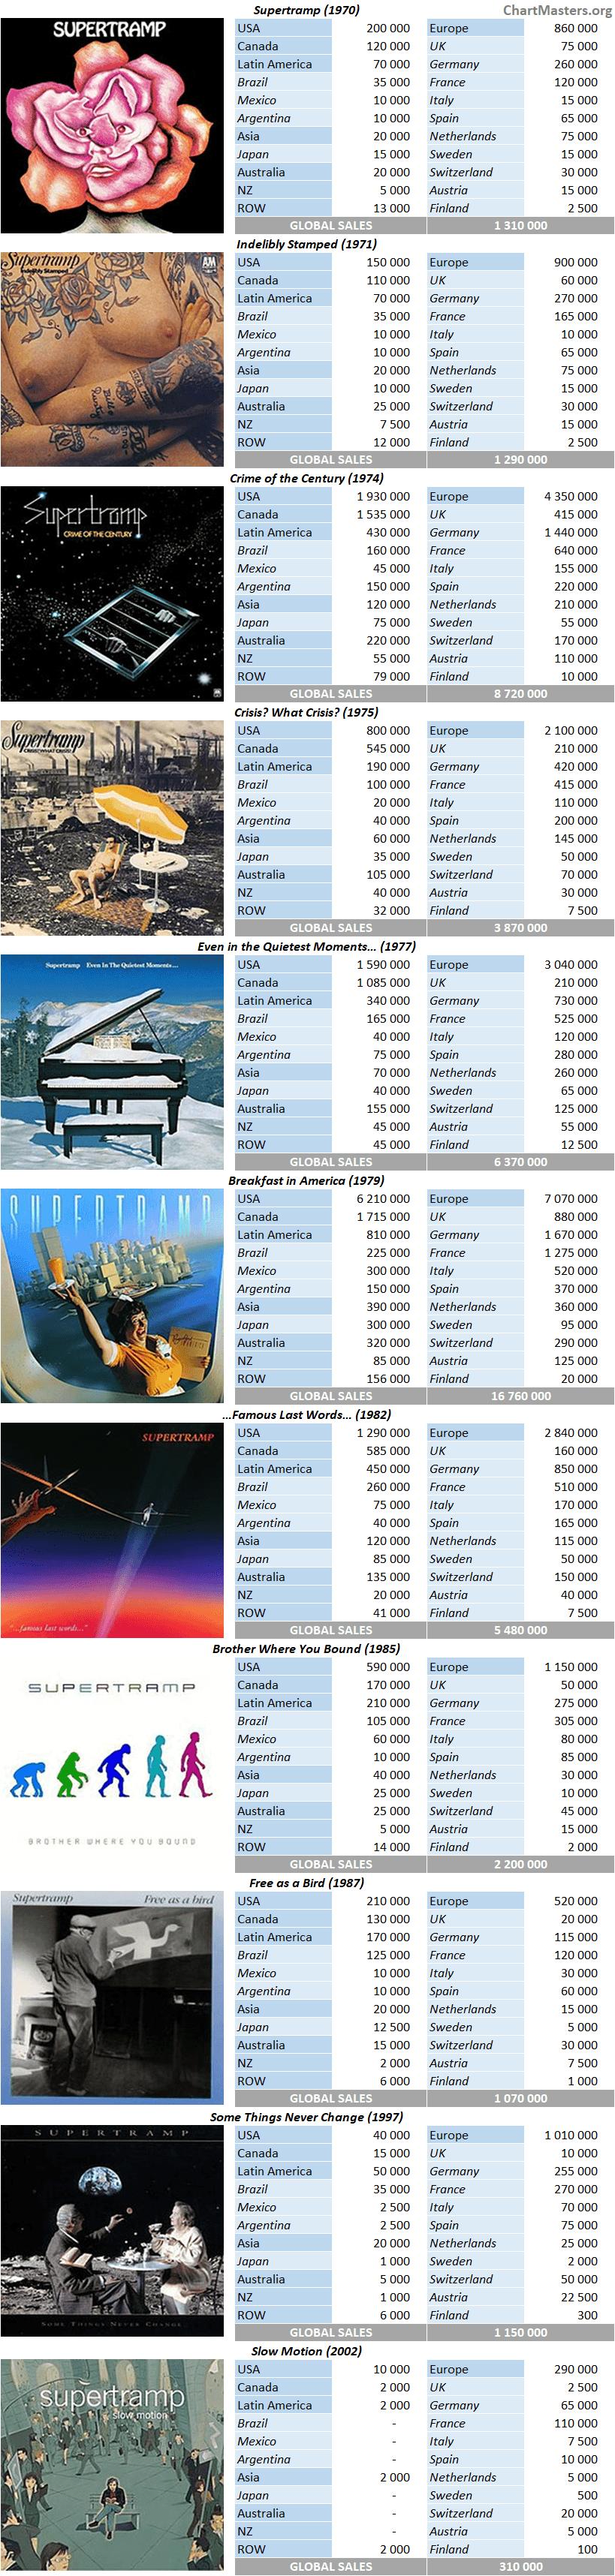 Supertramp Album sales breakdowns